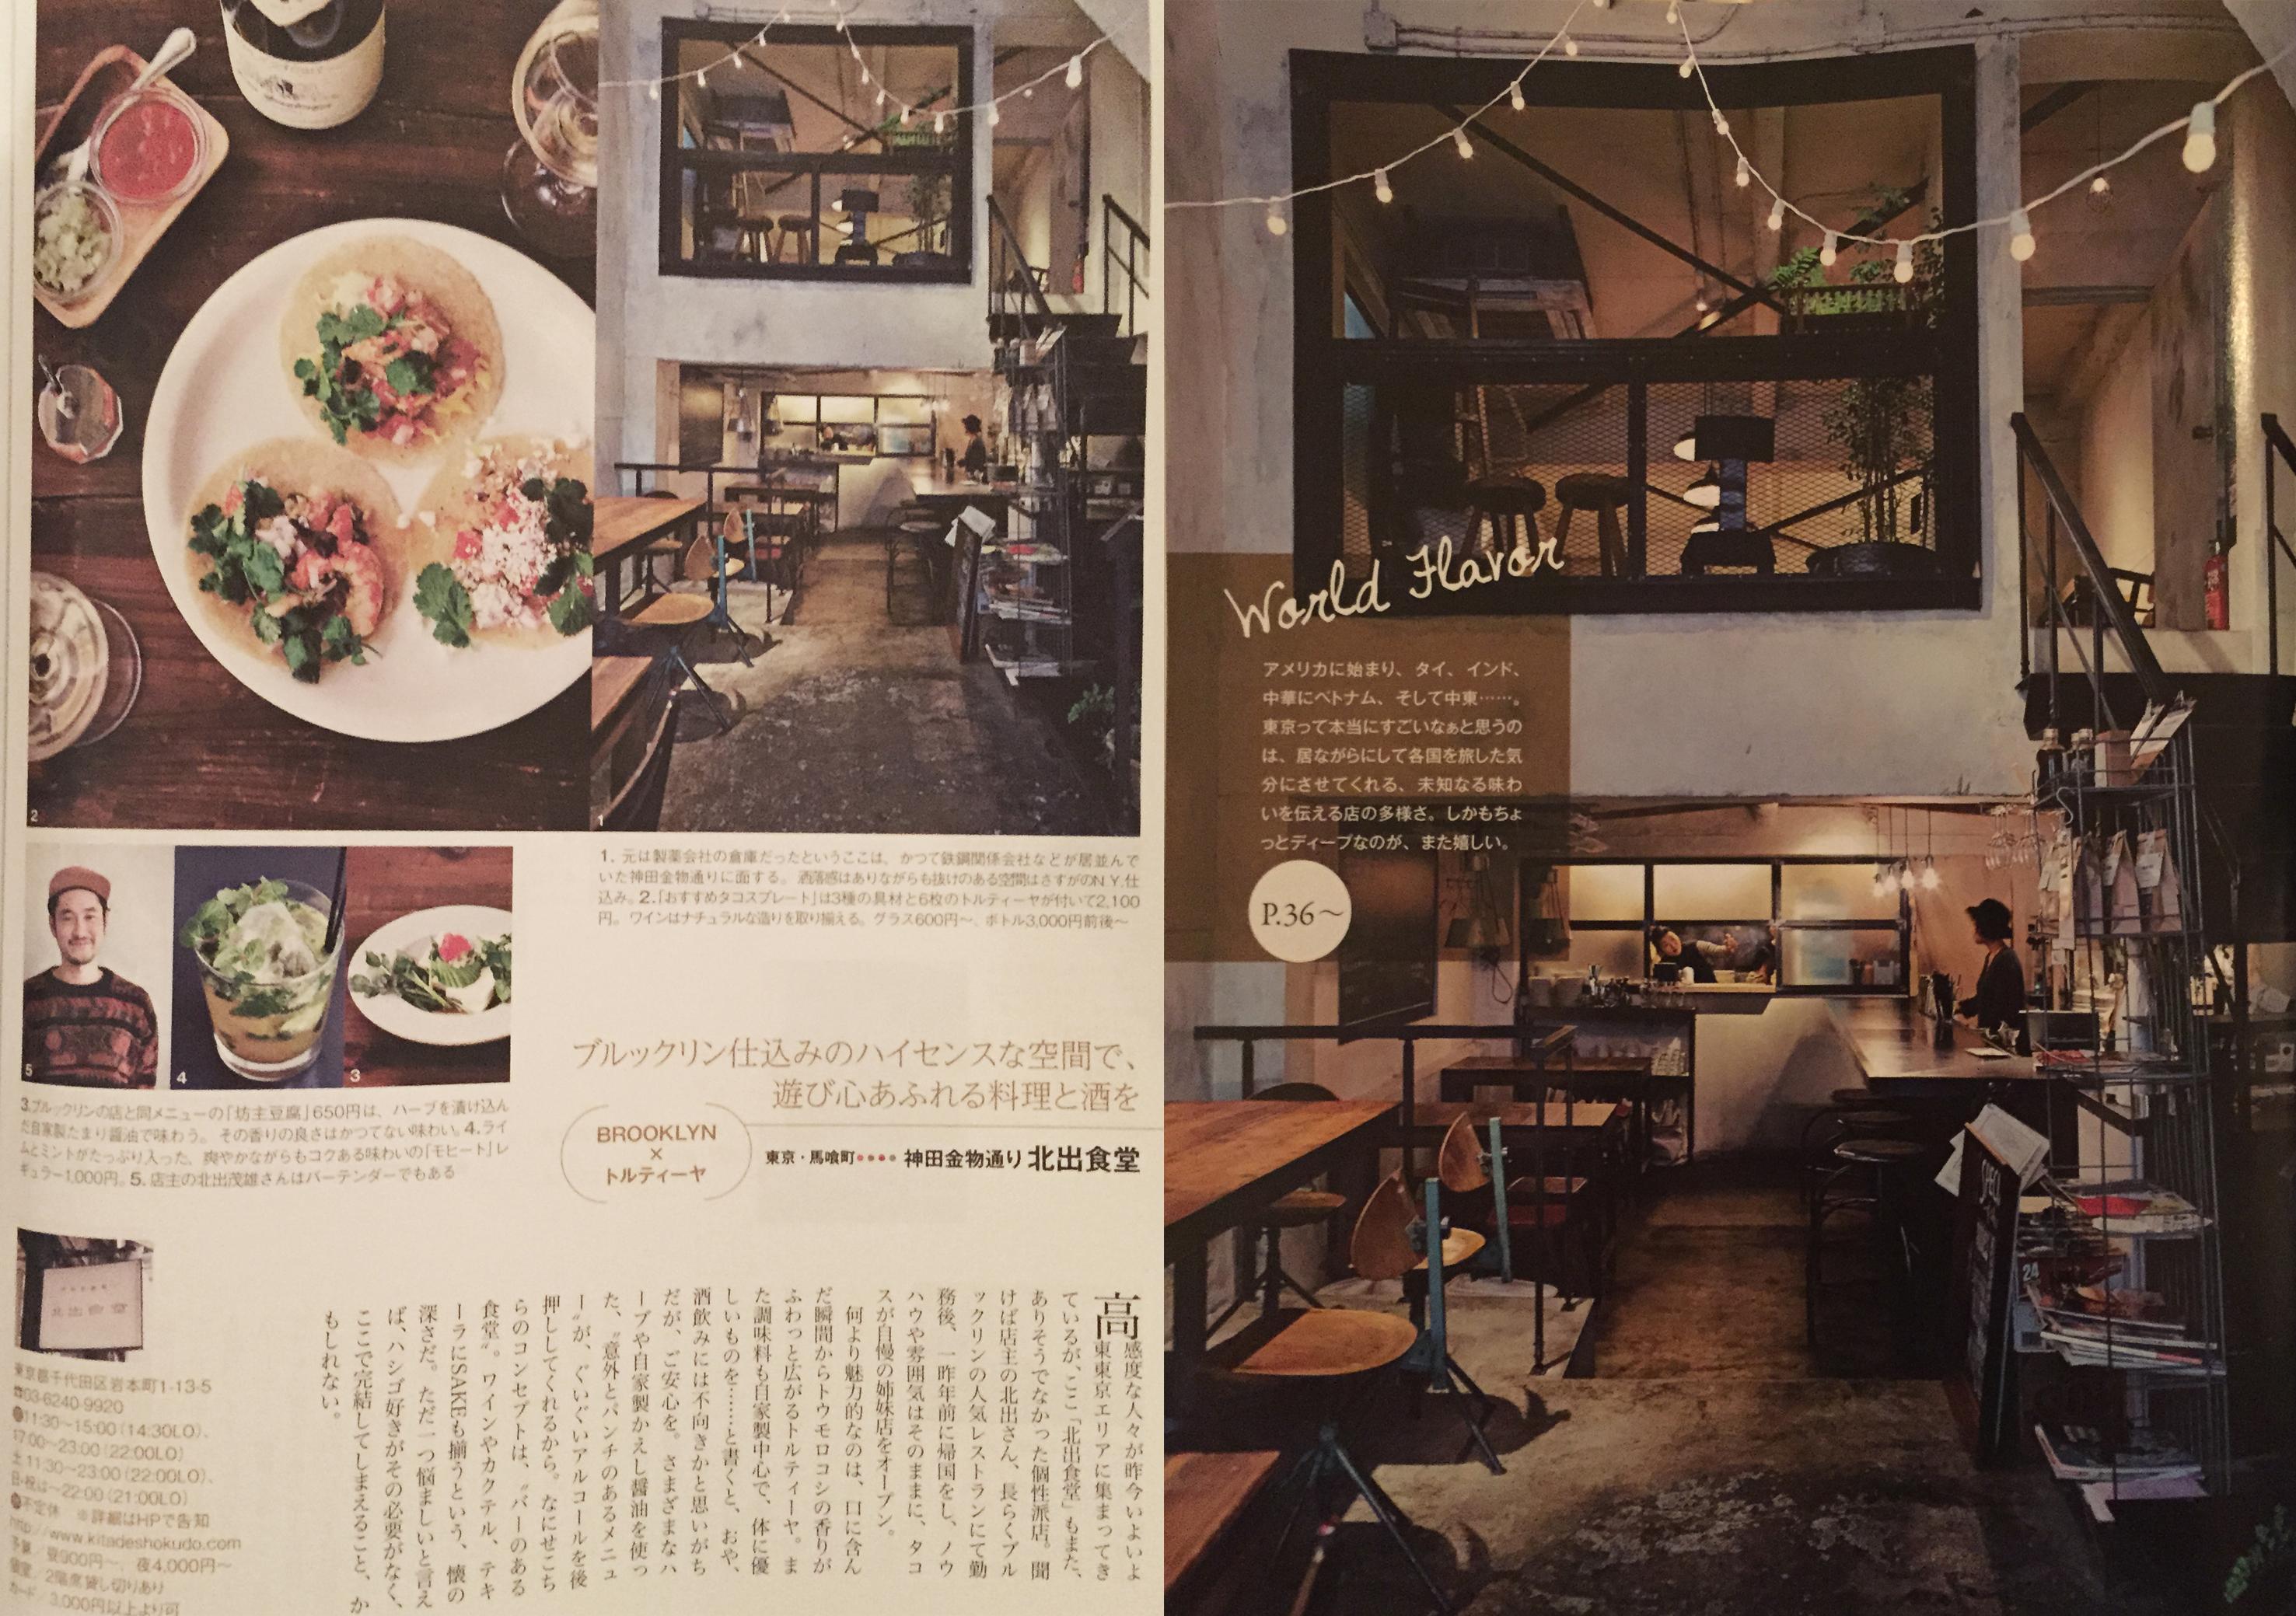 SYOKURAKU 2015/SPRING